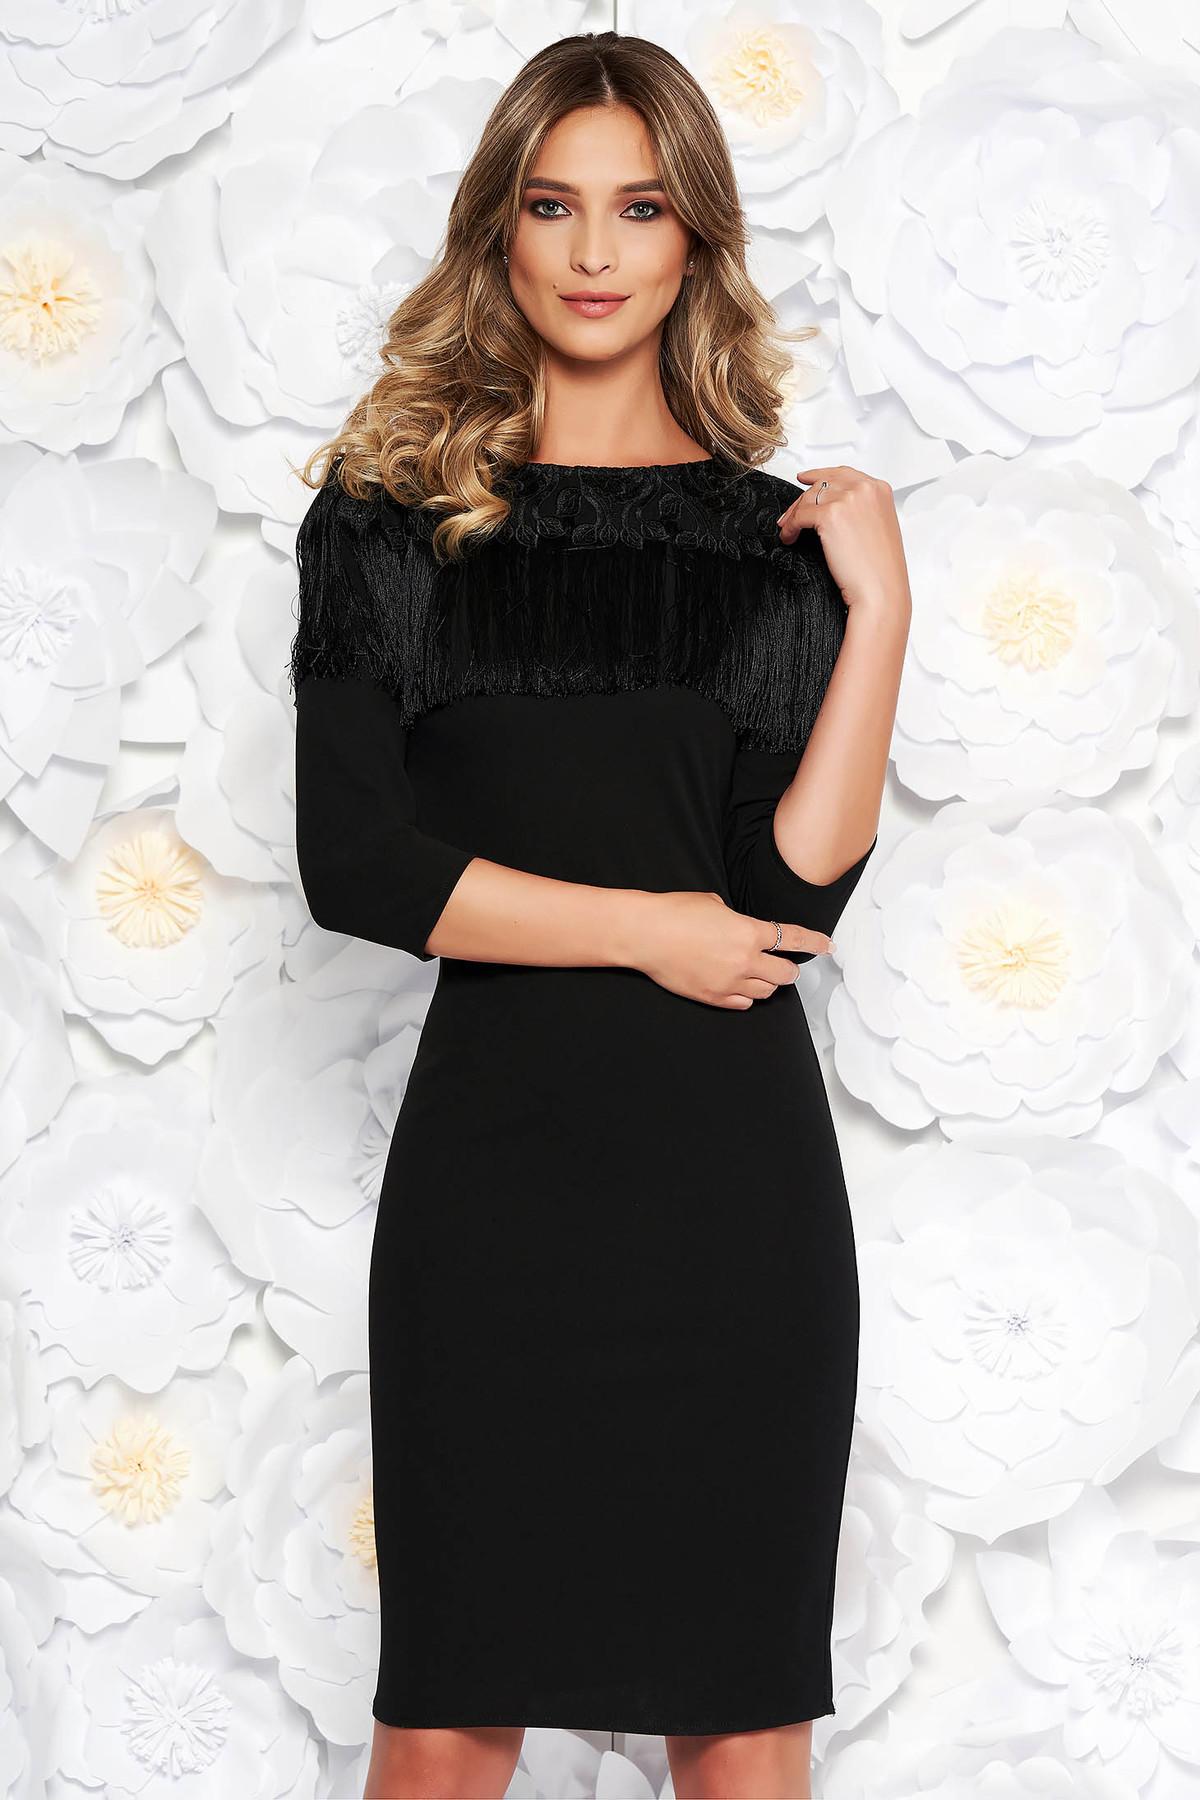 Rochie neagra eleganta midi tip creion din material usor elastic cu franjuri cu aplicatii de dantela